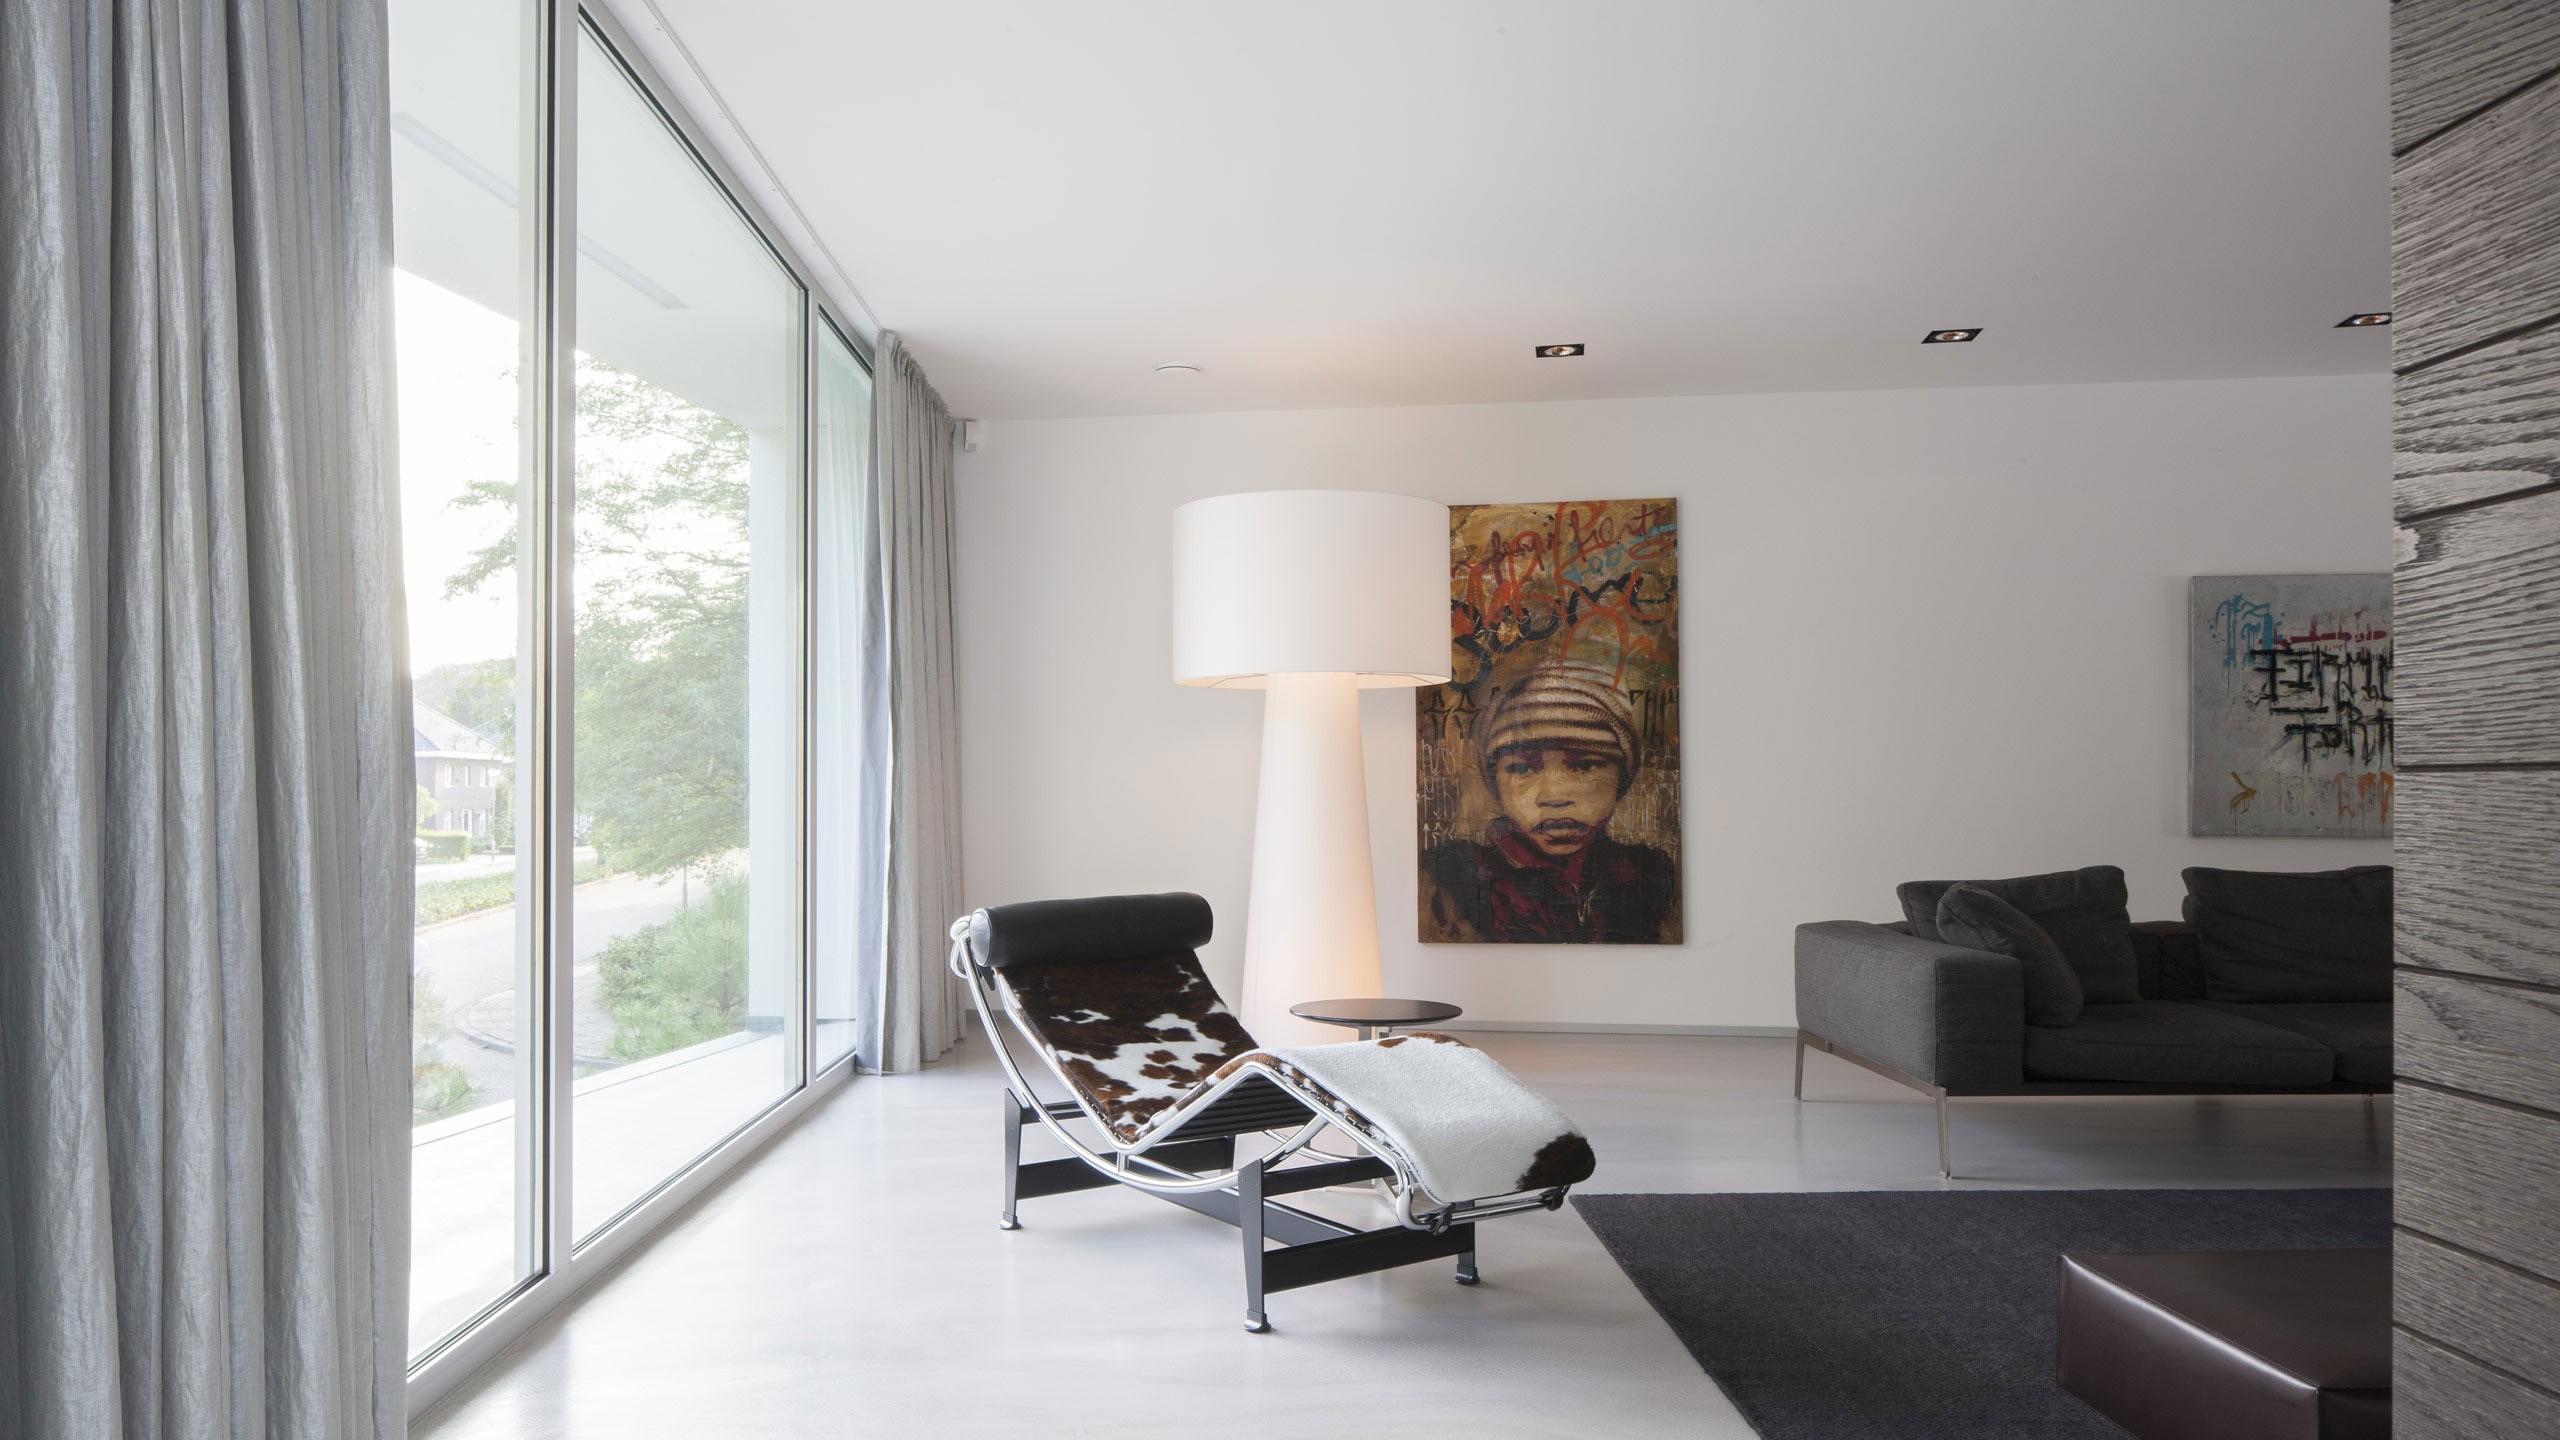 Boxed Villa Spee Haelen with Panoramic Windows by Lab32 architecten-14